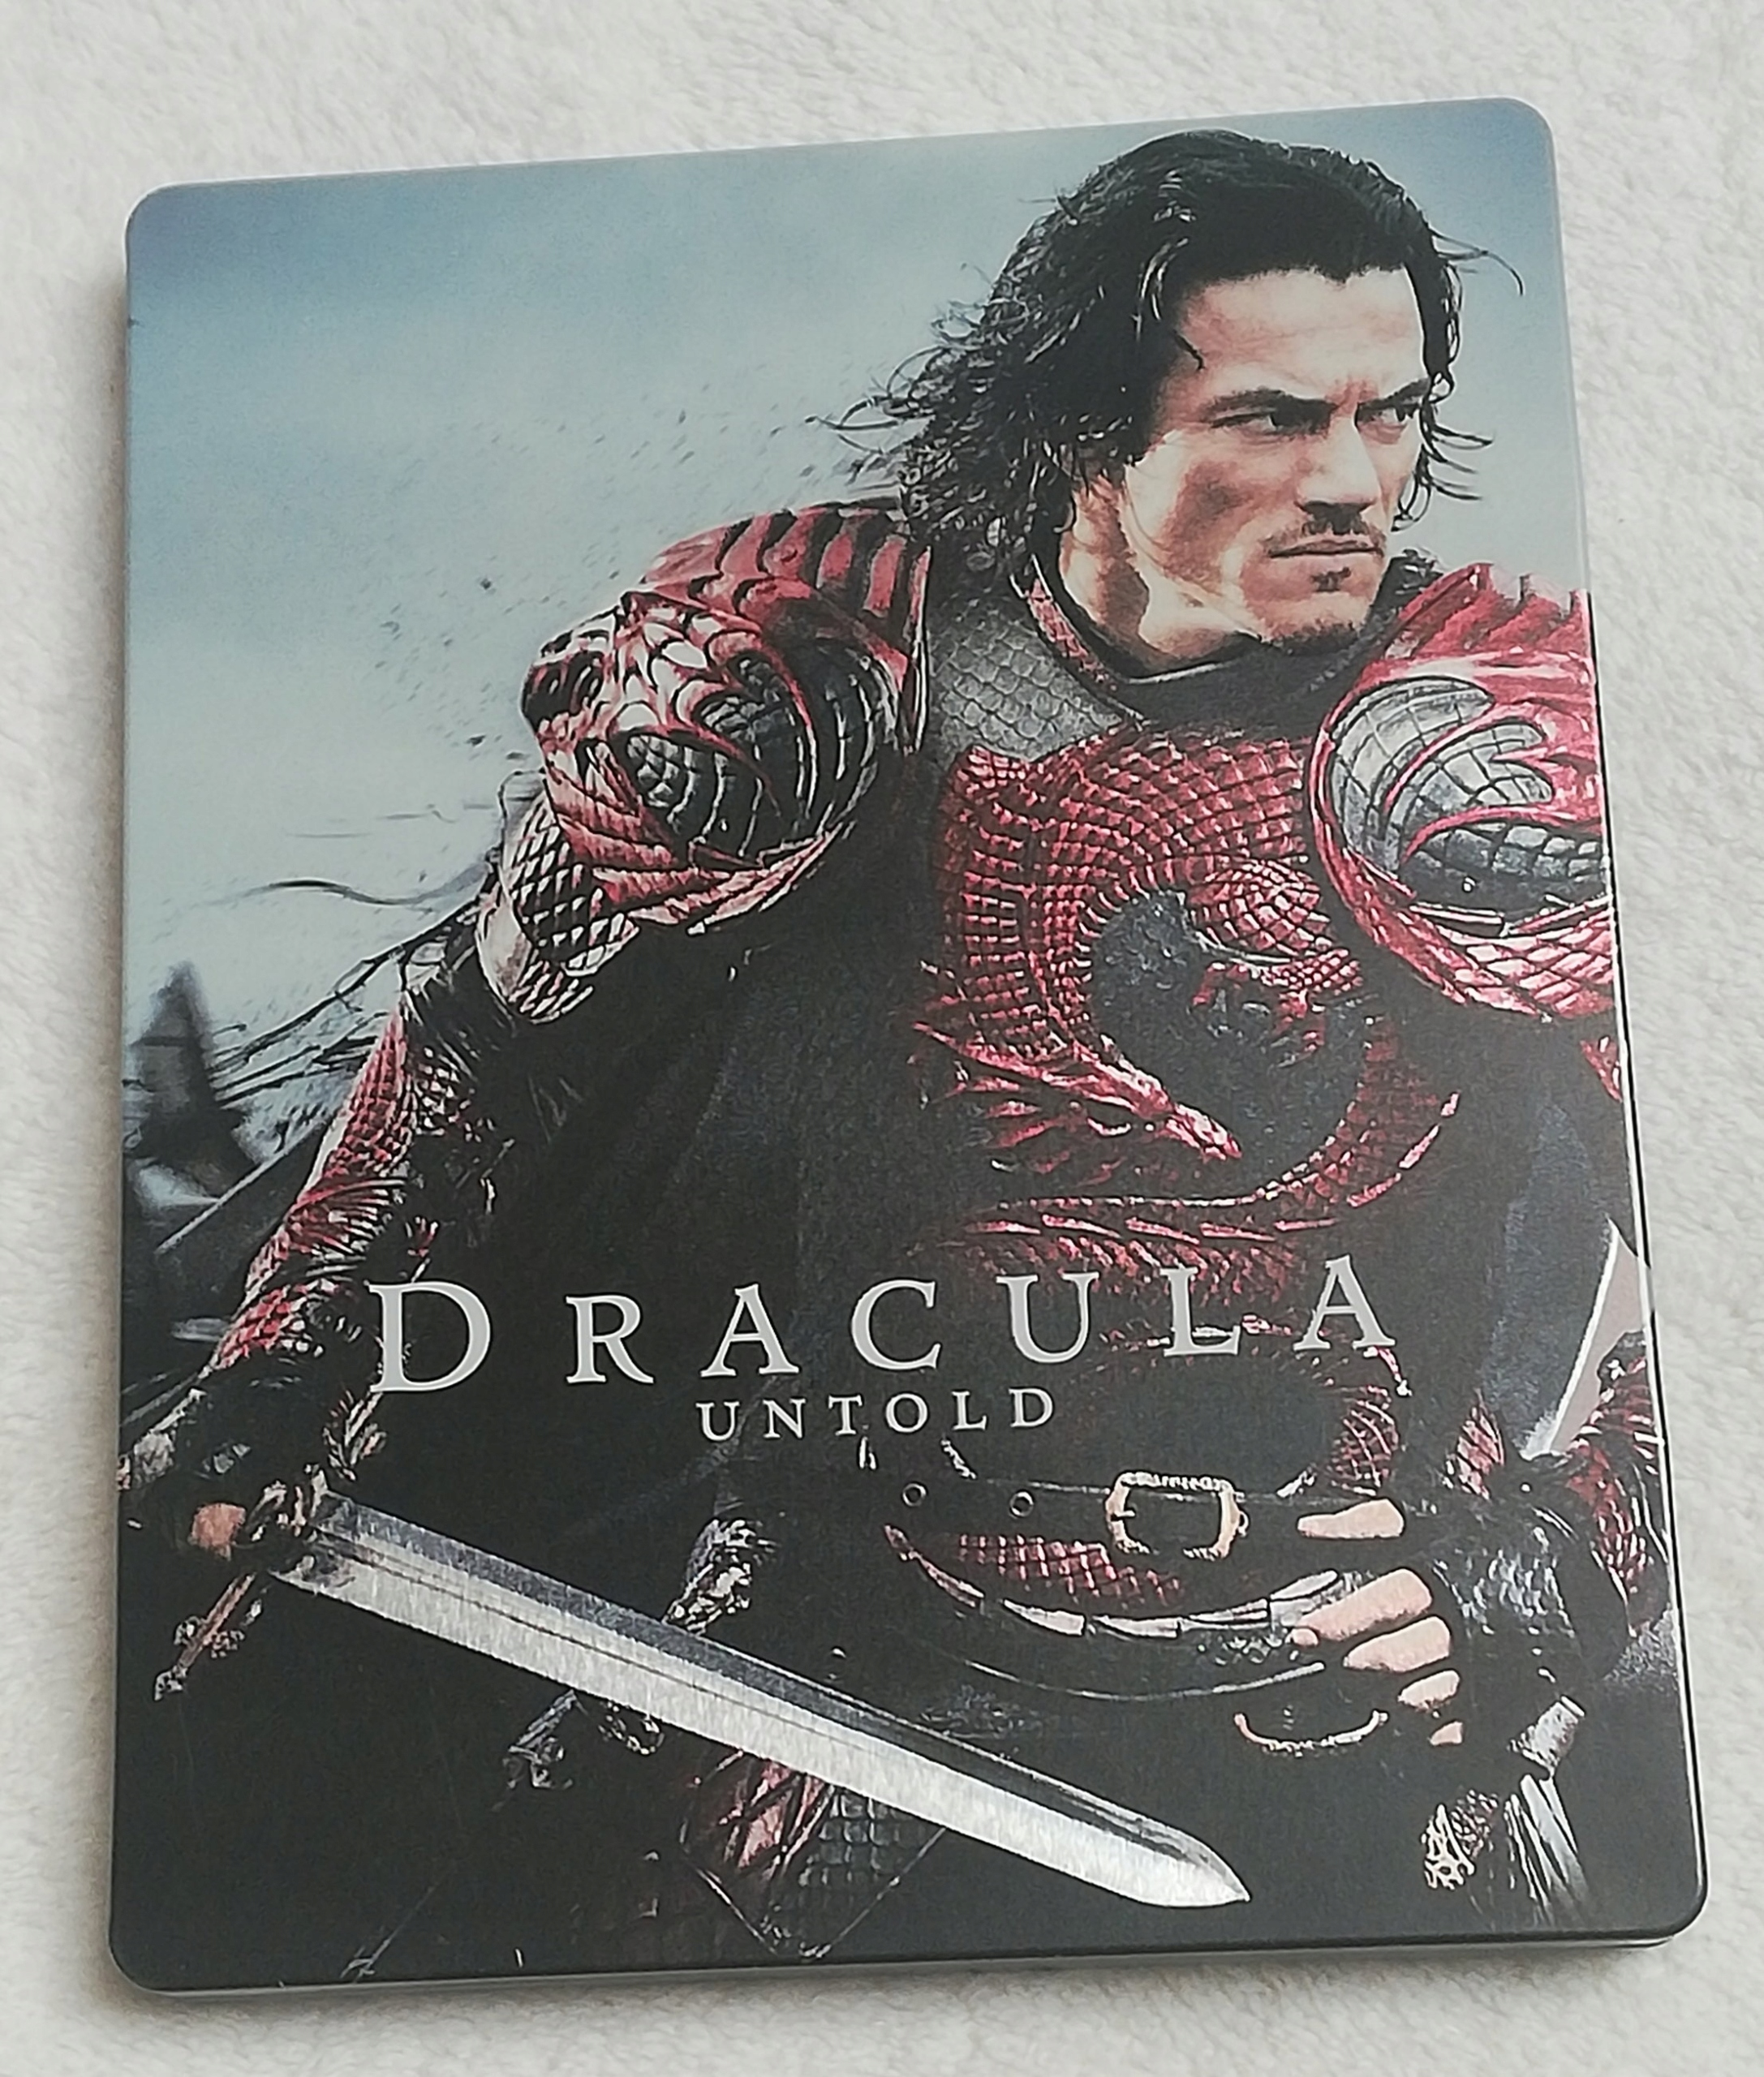 DRACULA - HISTORIA NIEZNANA [BLU-RAY] STEELBOOK